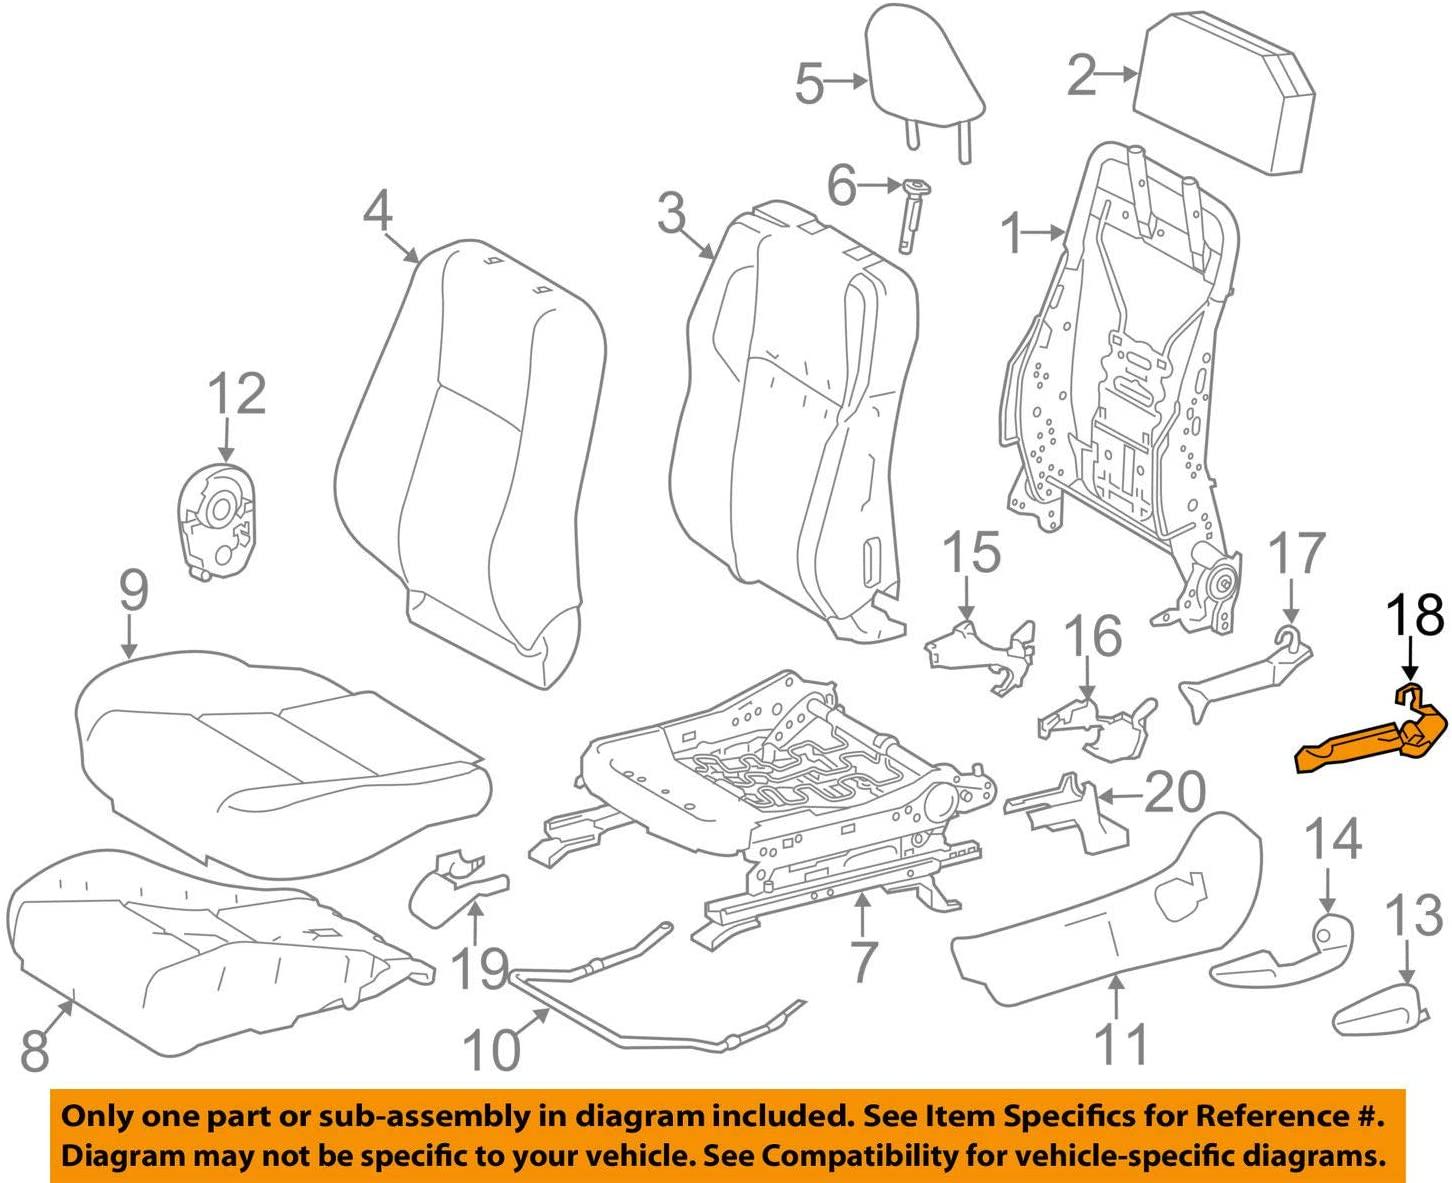 TOYOTA Genuine 71874-47040 Seat Cushion Shield